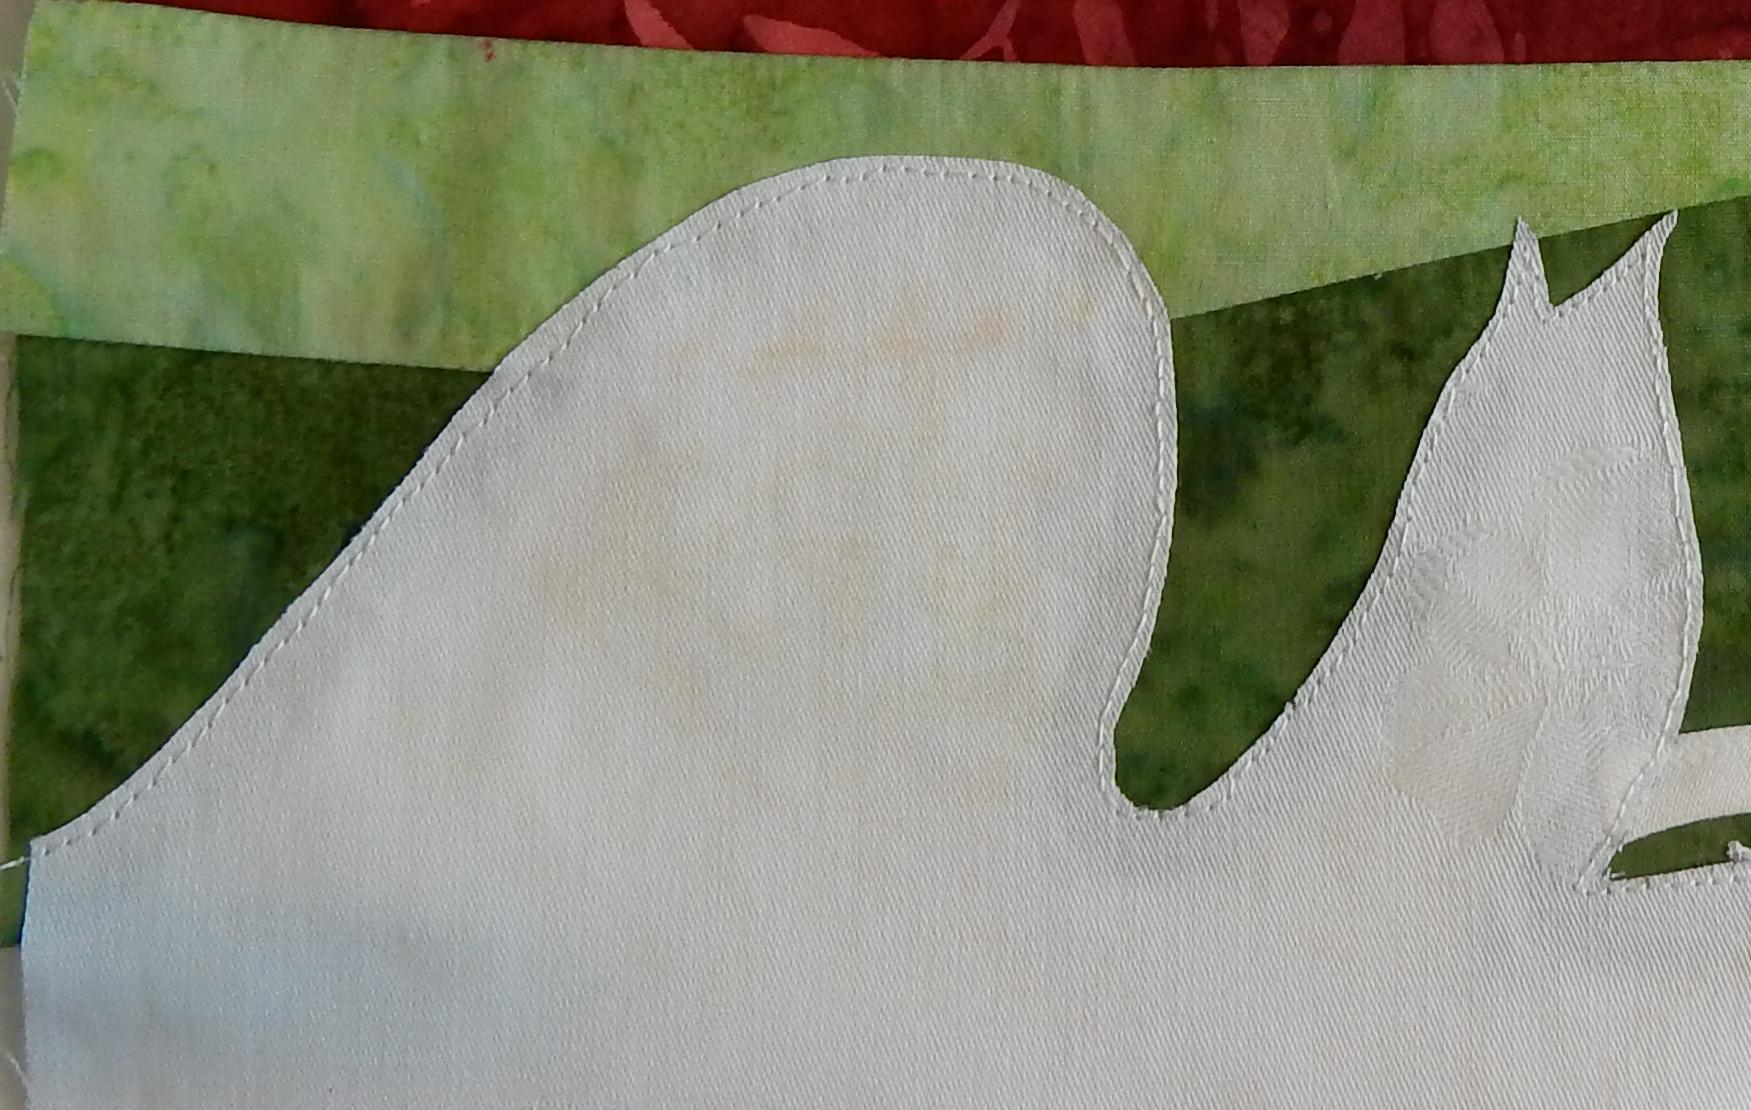 Green Woman #7 07